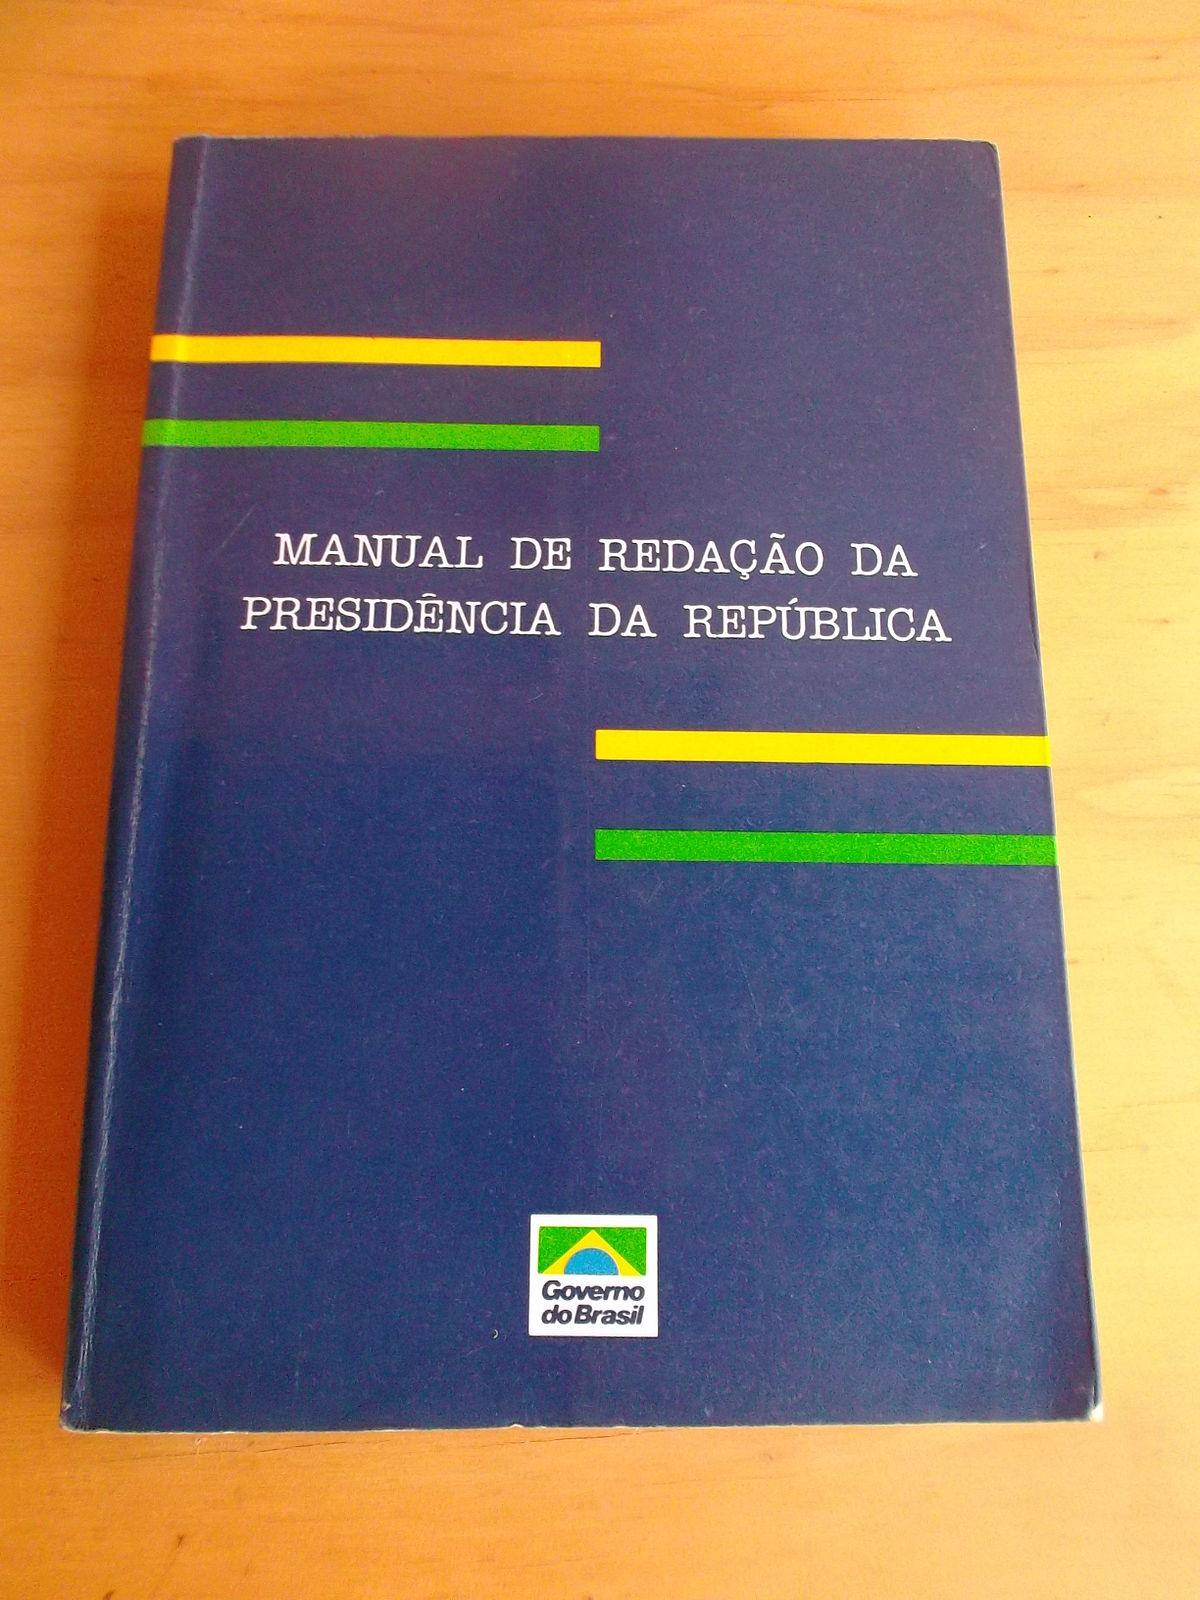 Manual De Reda U00e7 U00e3o Da Presid U00eancia Da Rep U00fablica  U2013 Wikip U00e9dia  A Enciclop U00e9dia Livre